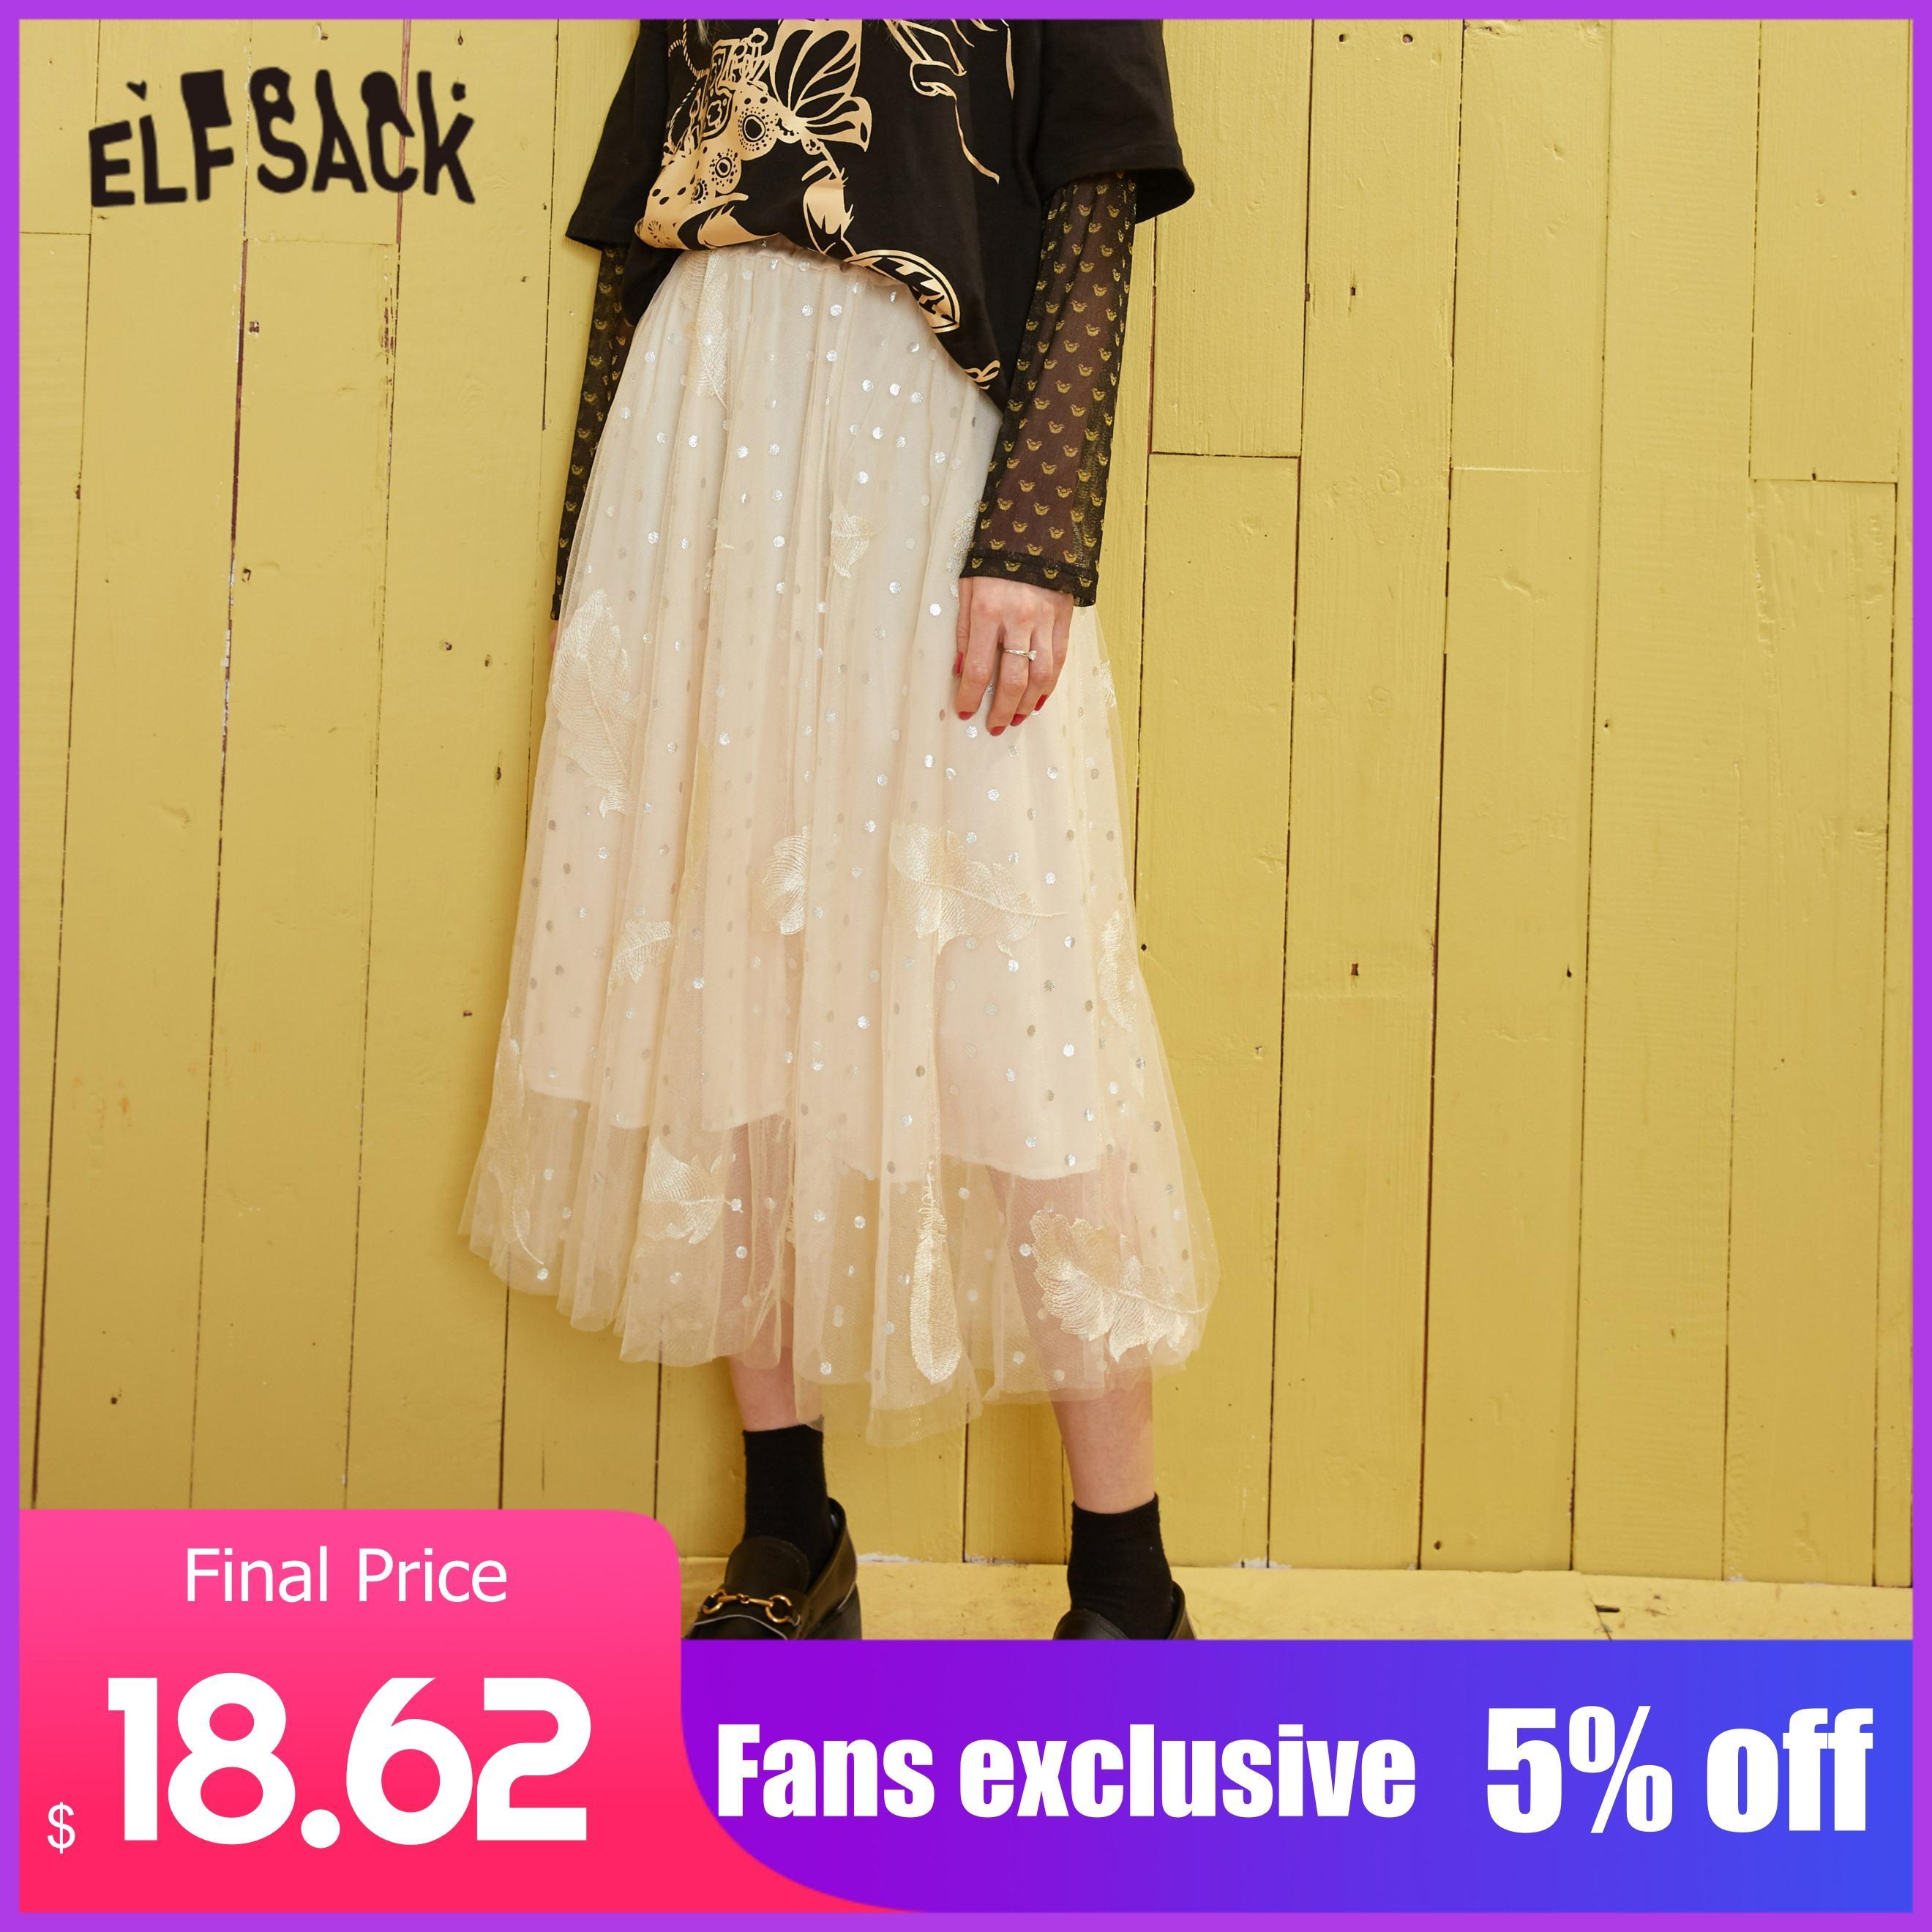 ELFSACK Black Polka Dot Feather Embroidery Casual Women Skirts 2020 Spring New White Contrast Mesh Ladies Korean Long Bottom